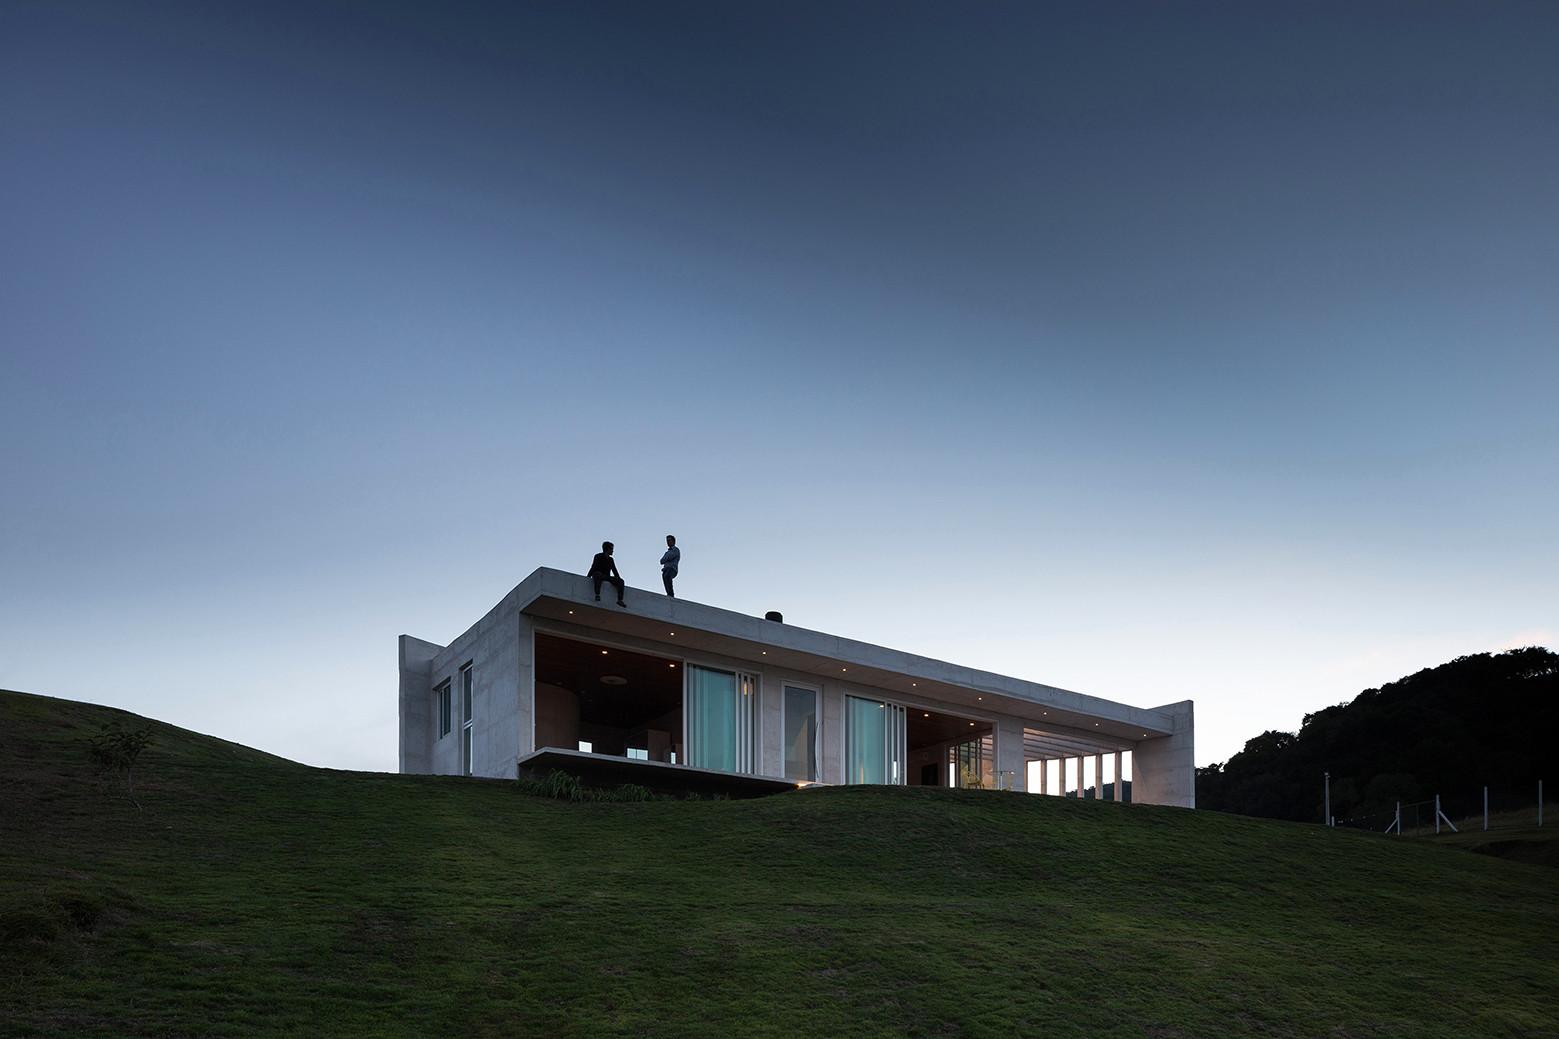 Дом на вершине холма в Бразилии